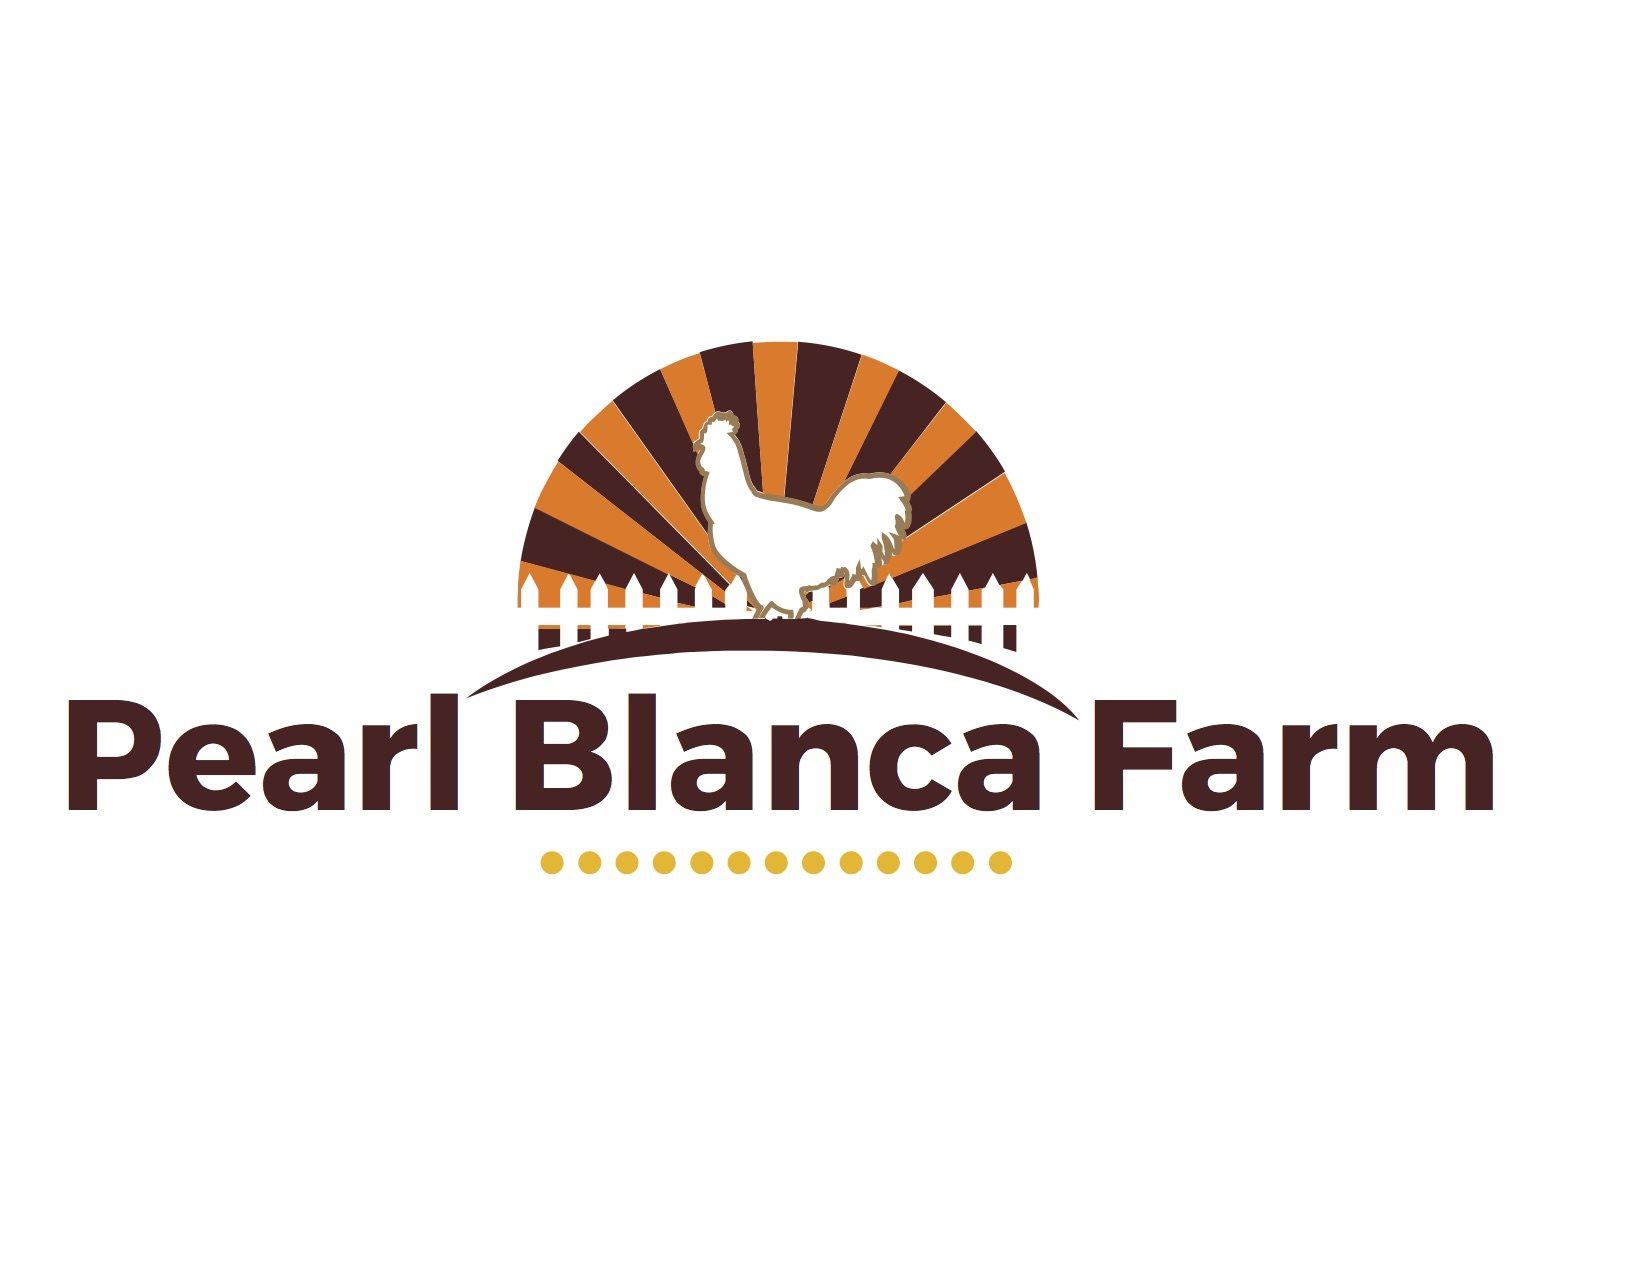 Pearl Blanca Farm